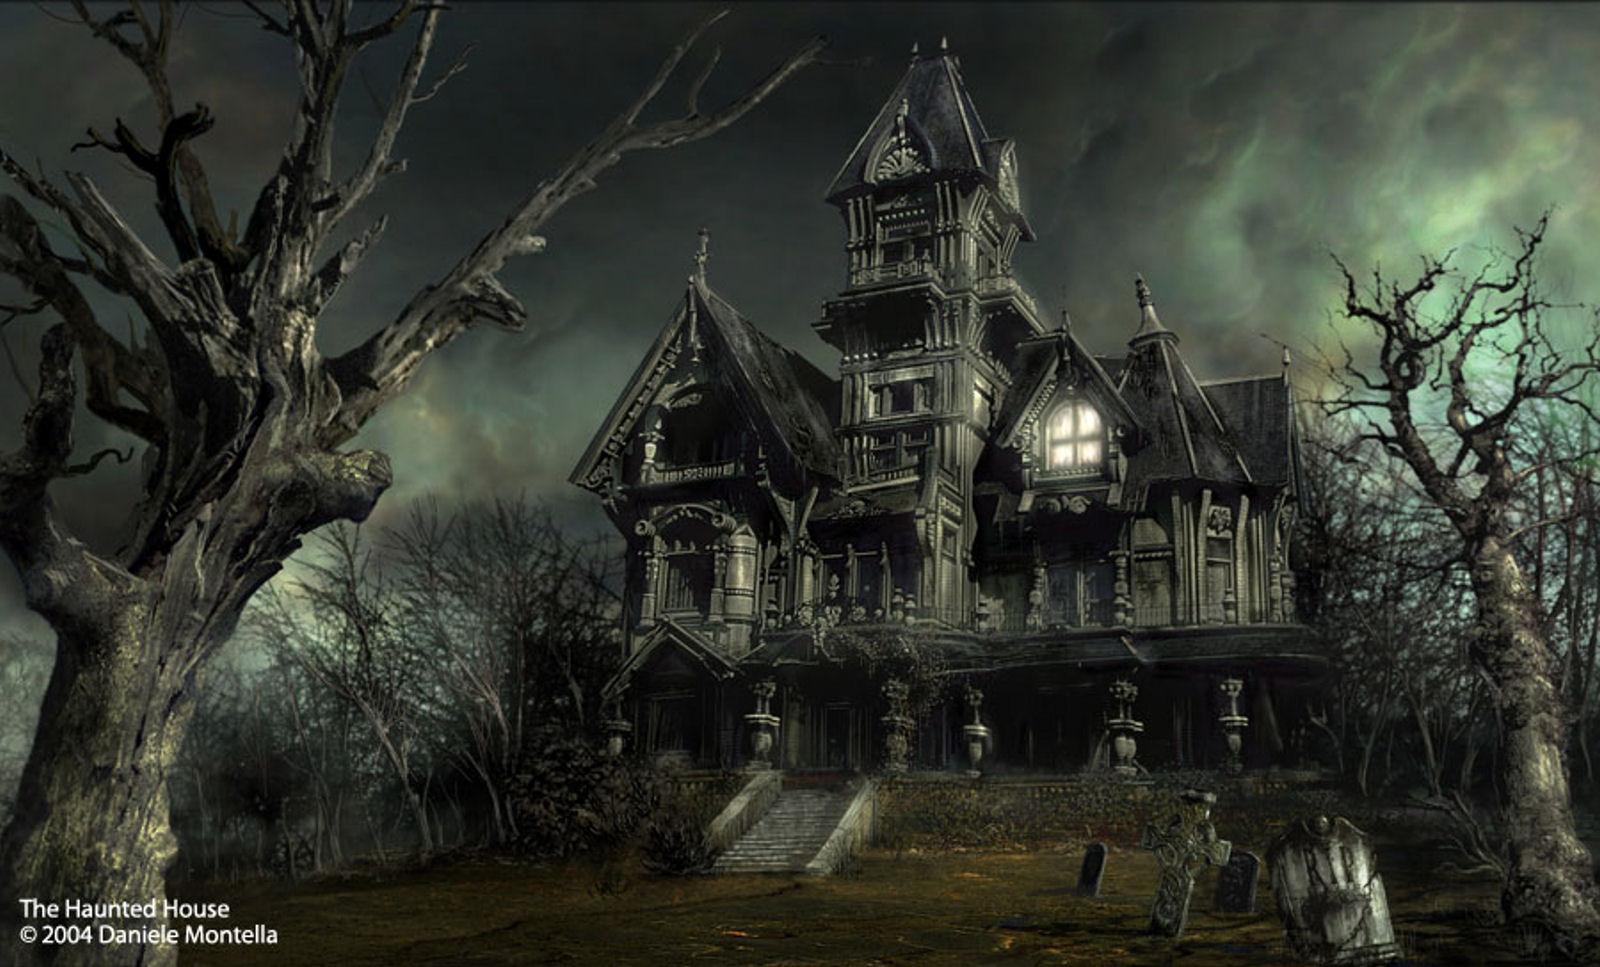 Haunted House by Daniele Montella 1600x967